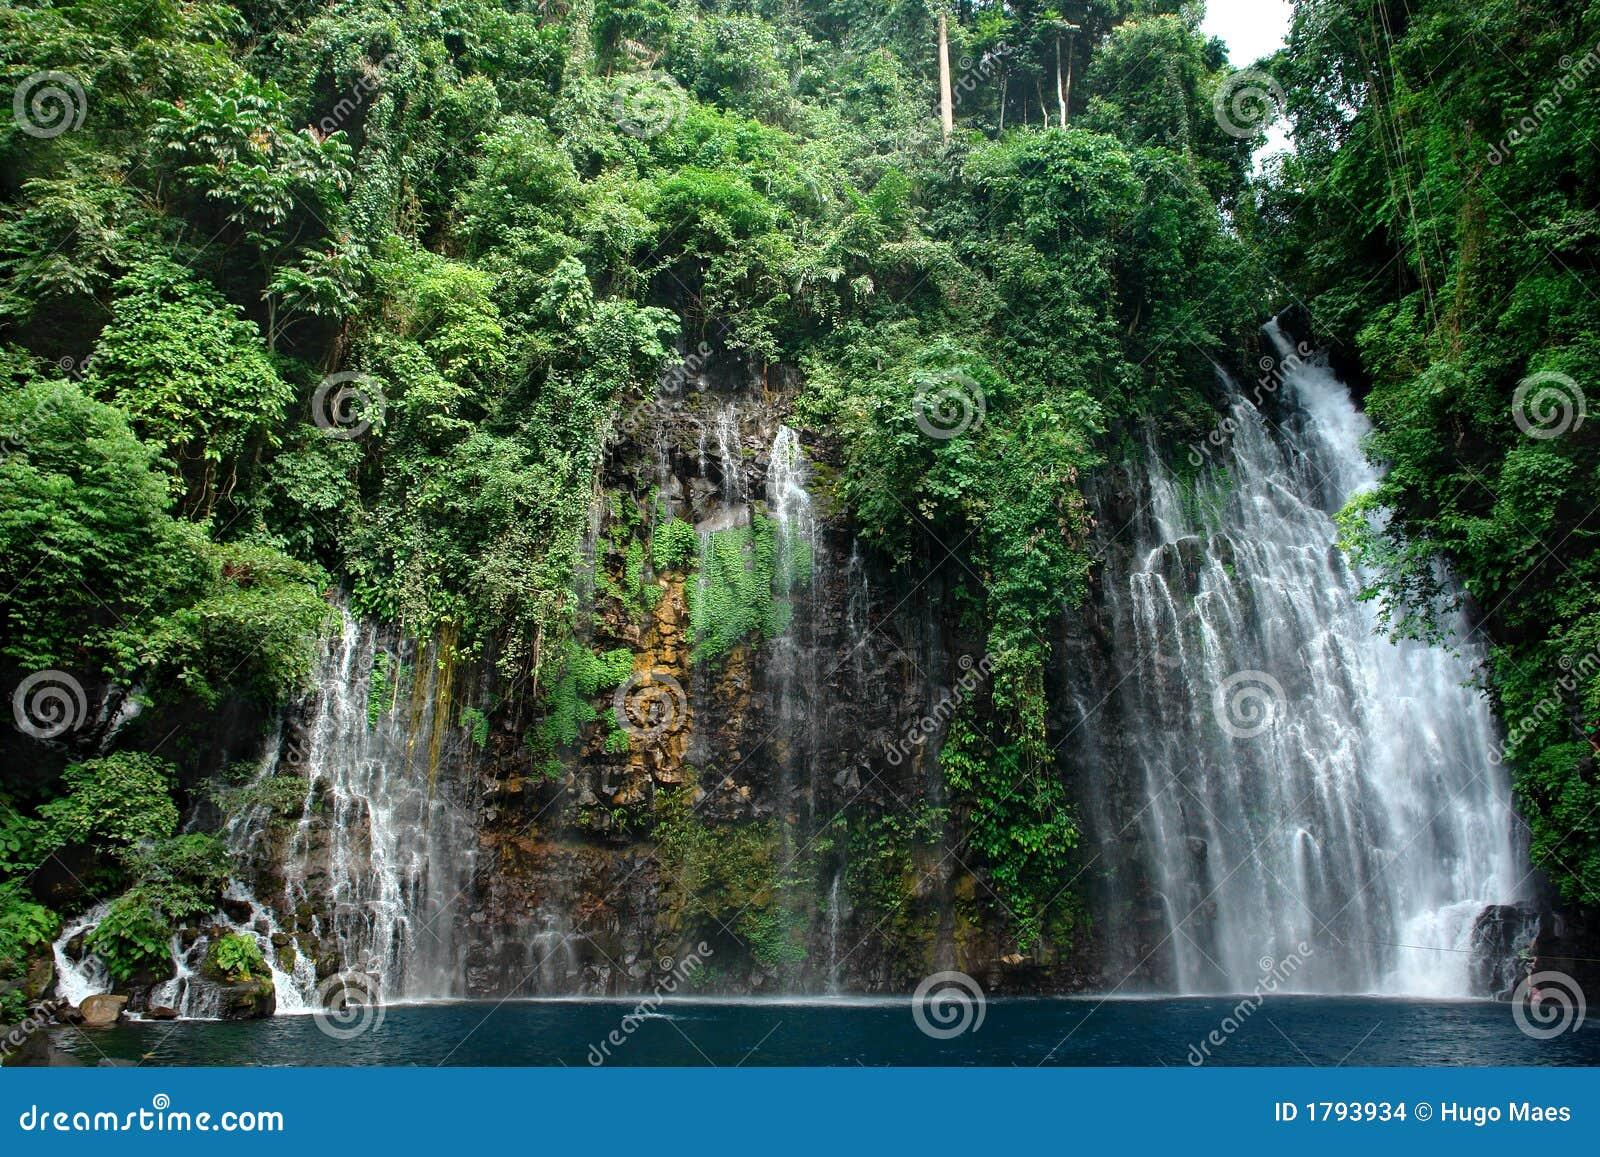 Cascata tropicale in giungla